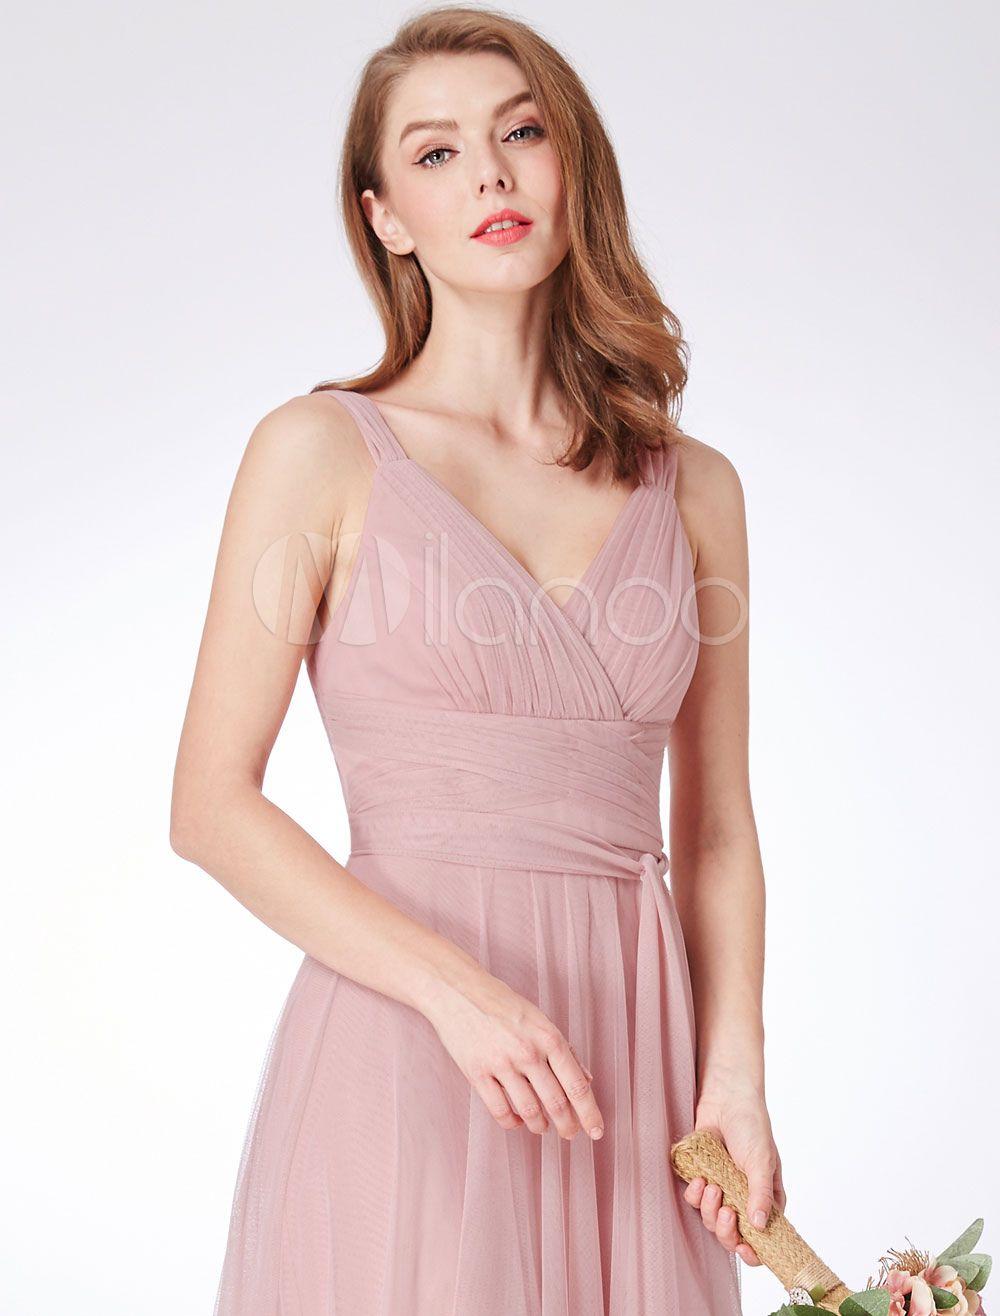 Bridesmaid Dresses Blush Pink V Neck Long Chiffon Sleeveless Prom